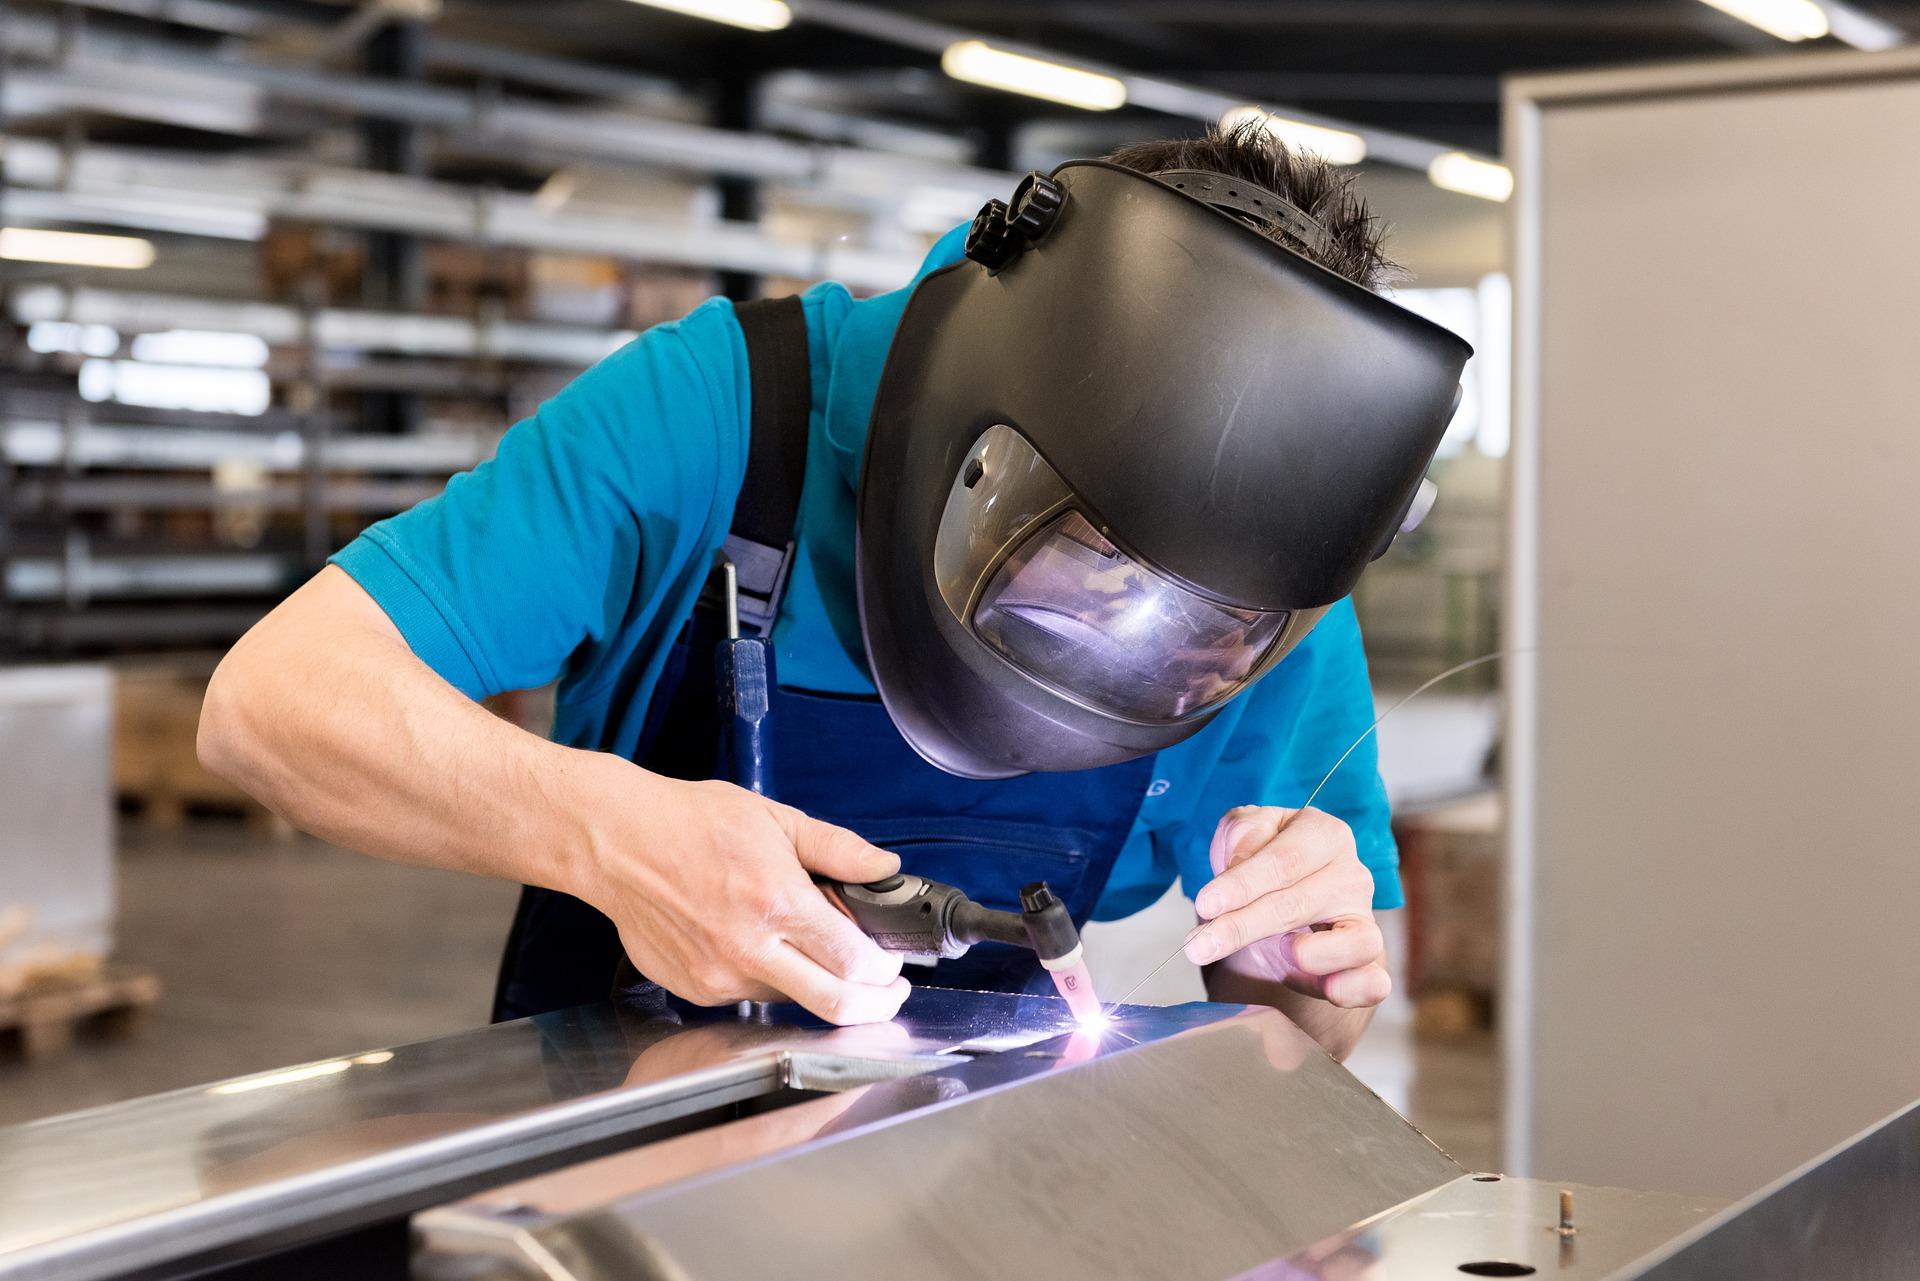 A professional welder working